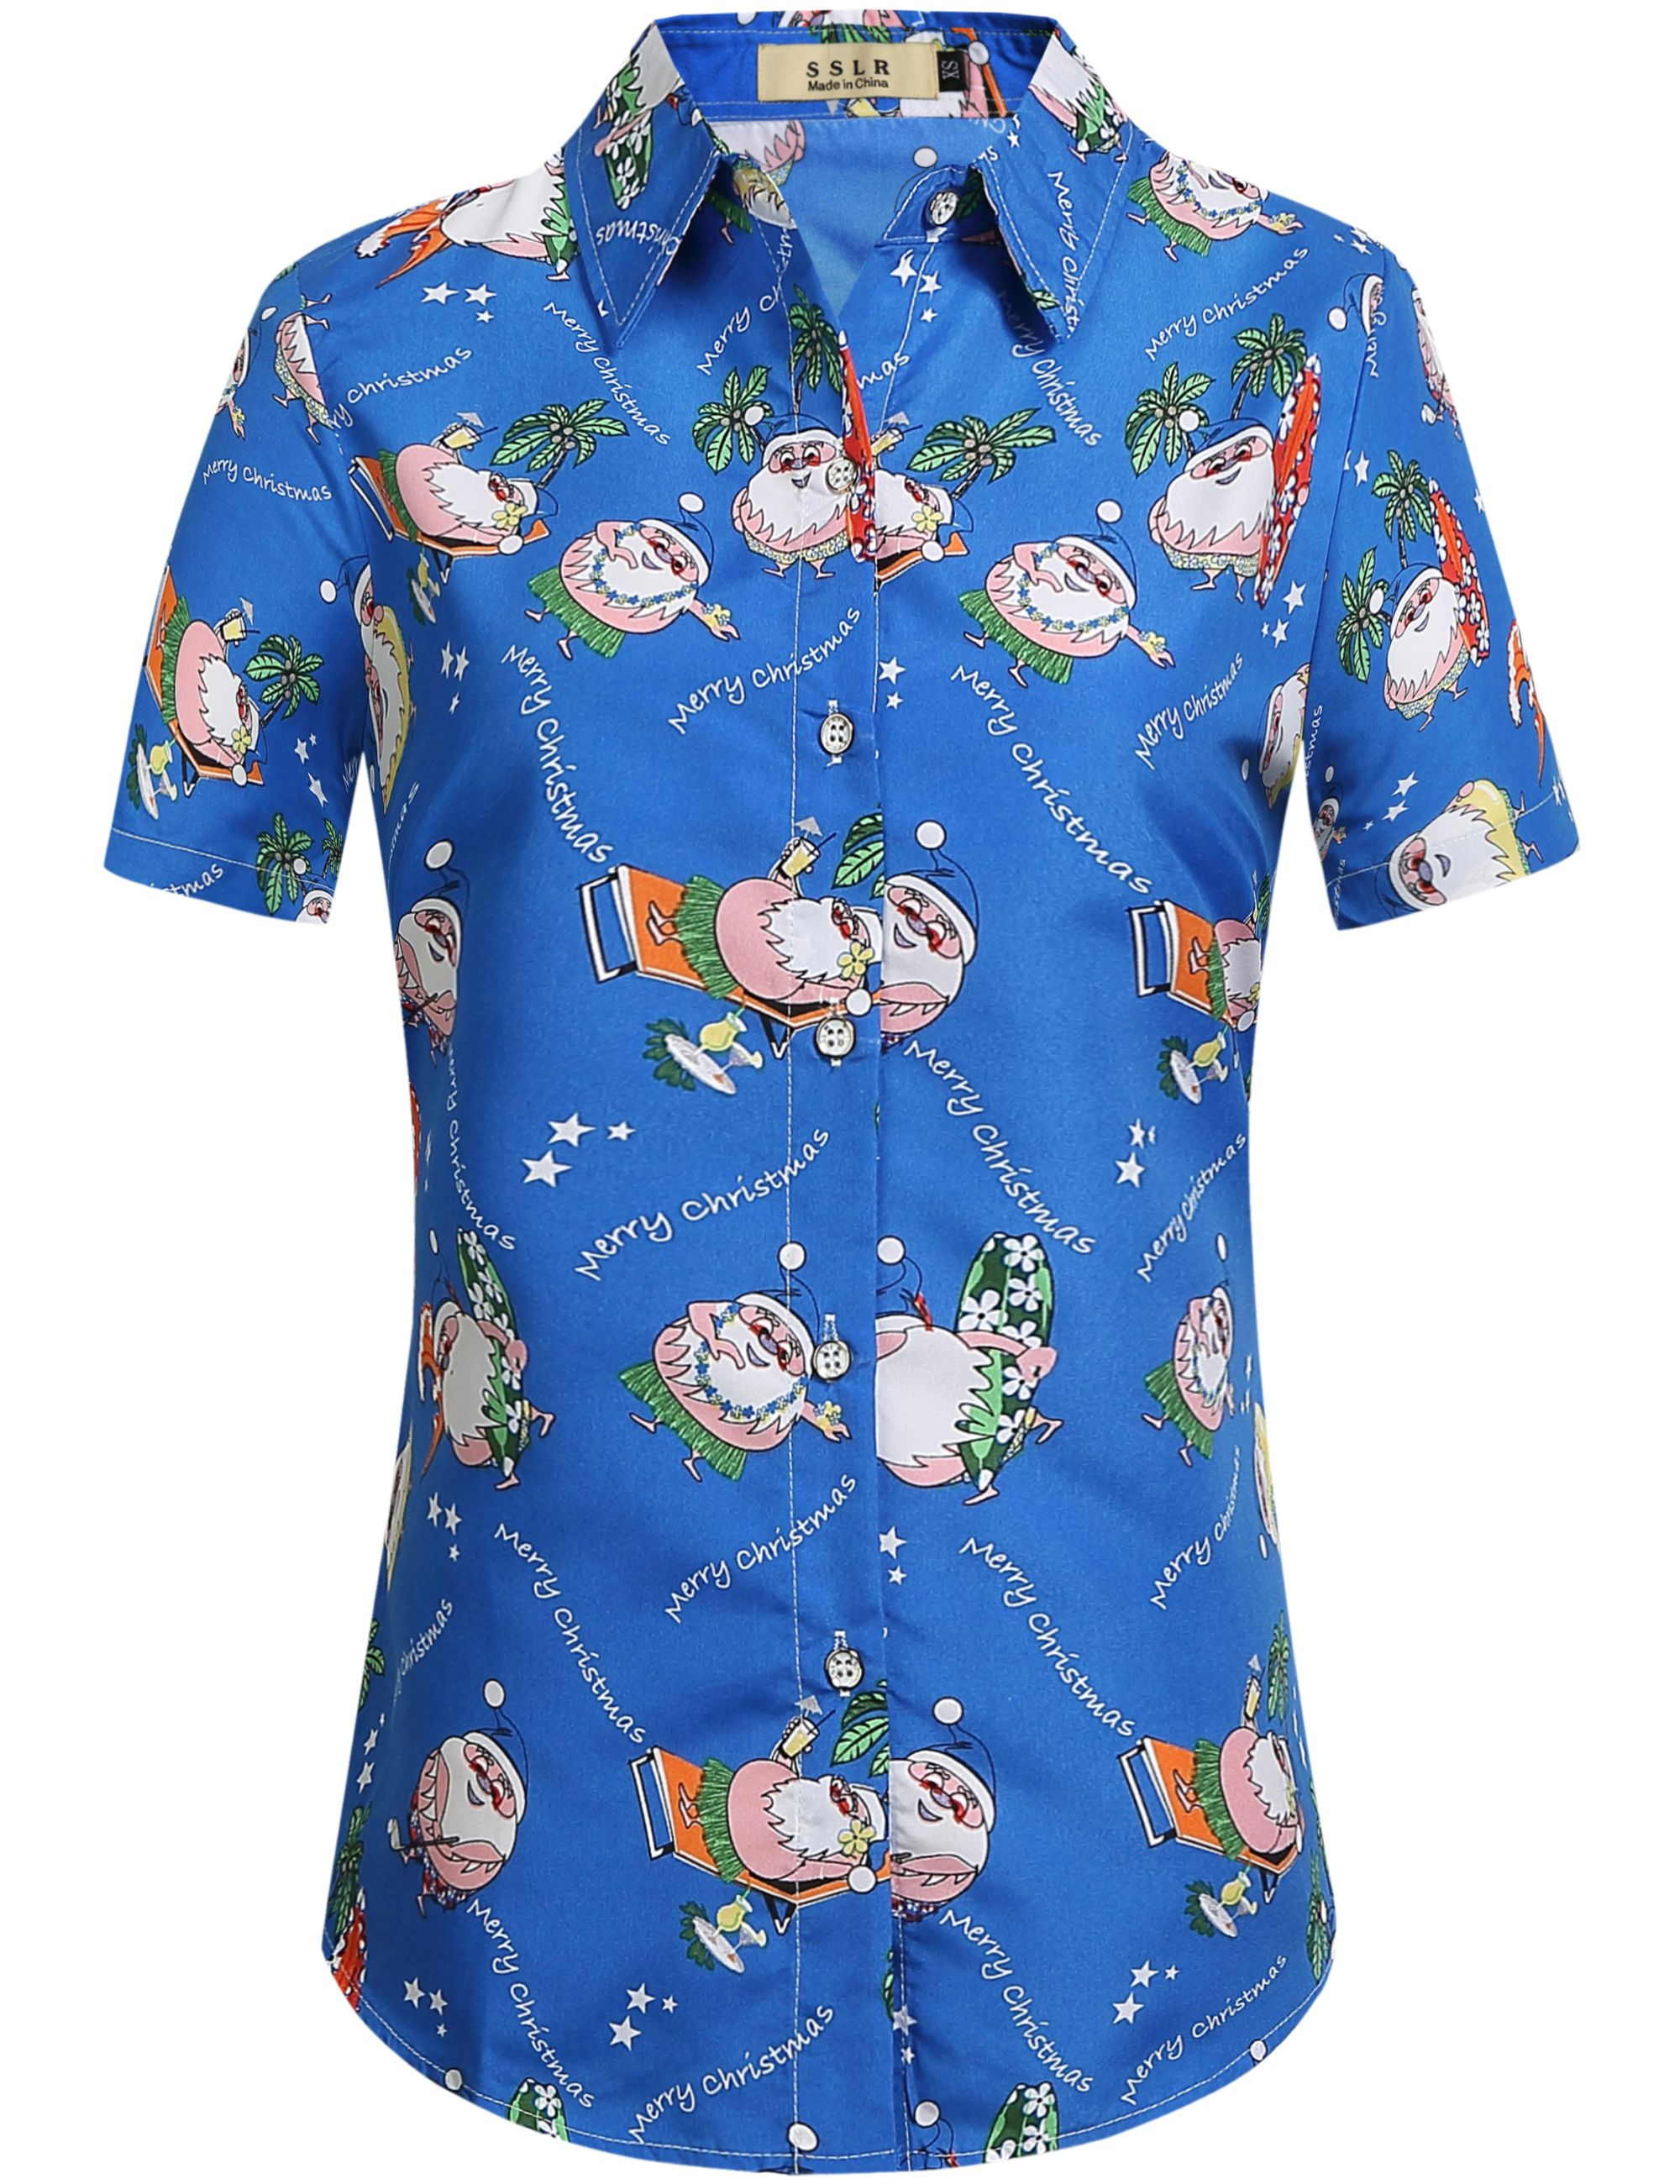 Christmas Hawaiian Shirt Womens.Pin On Christmas Hawaiian Shirt